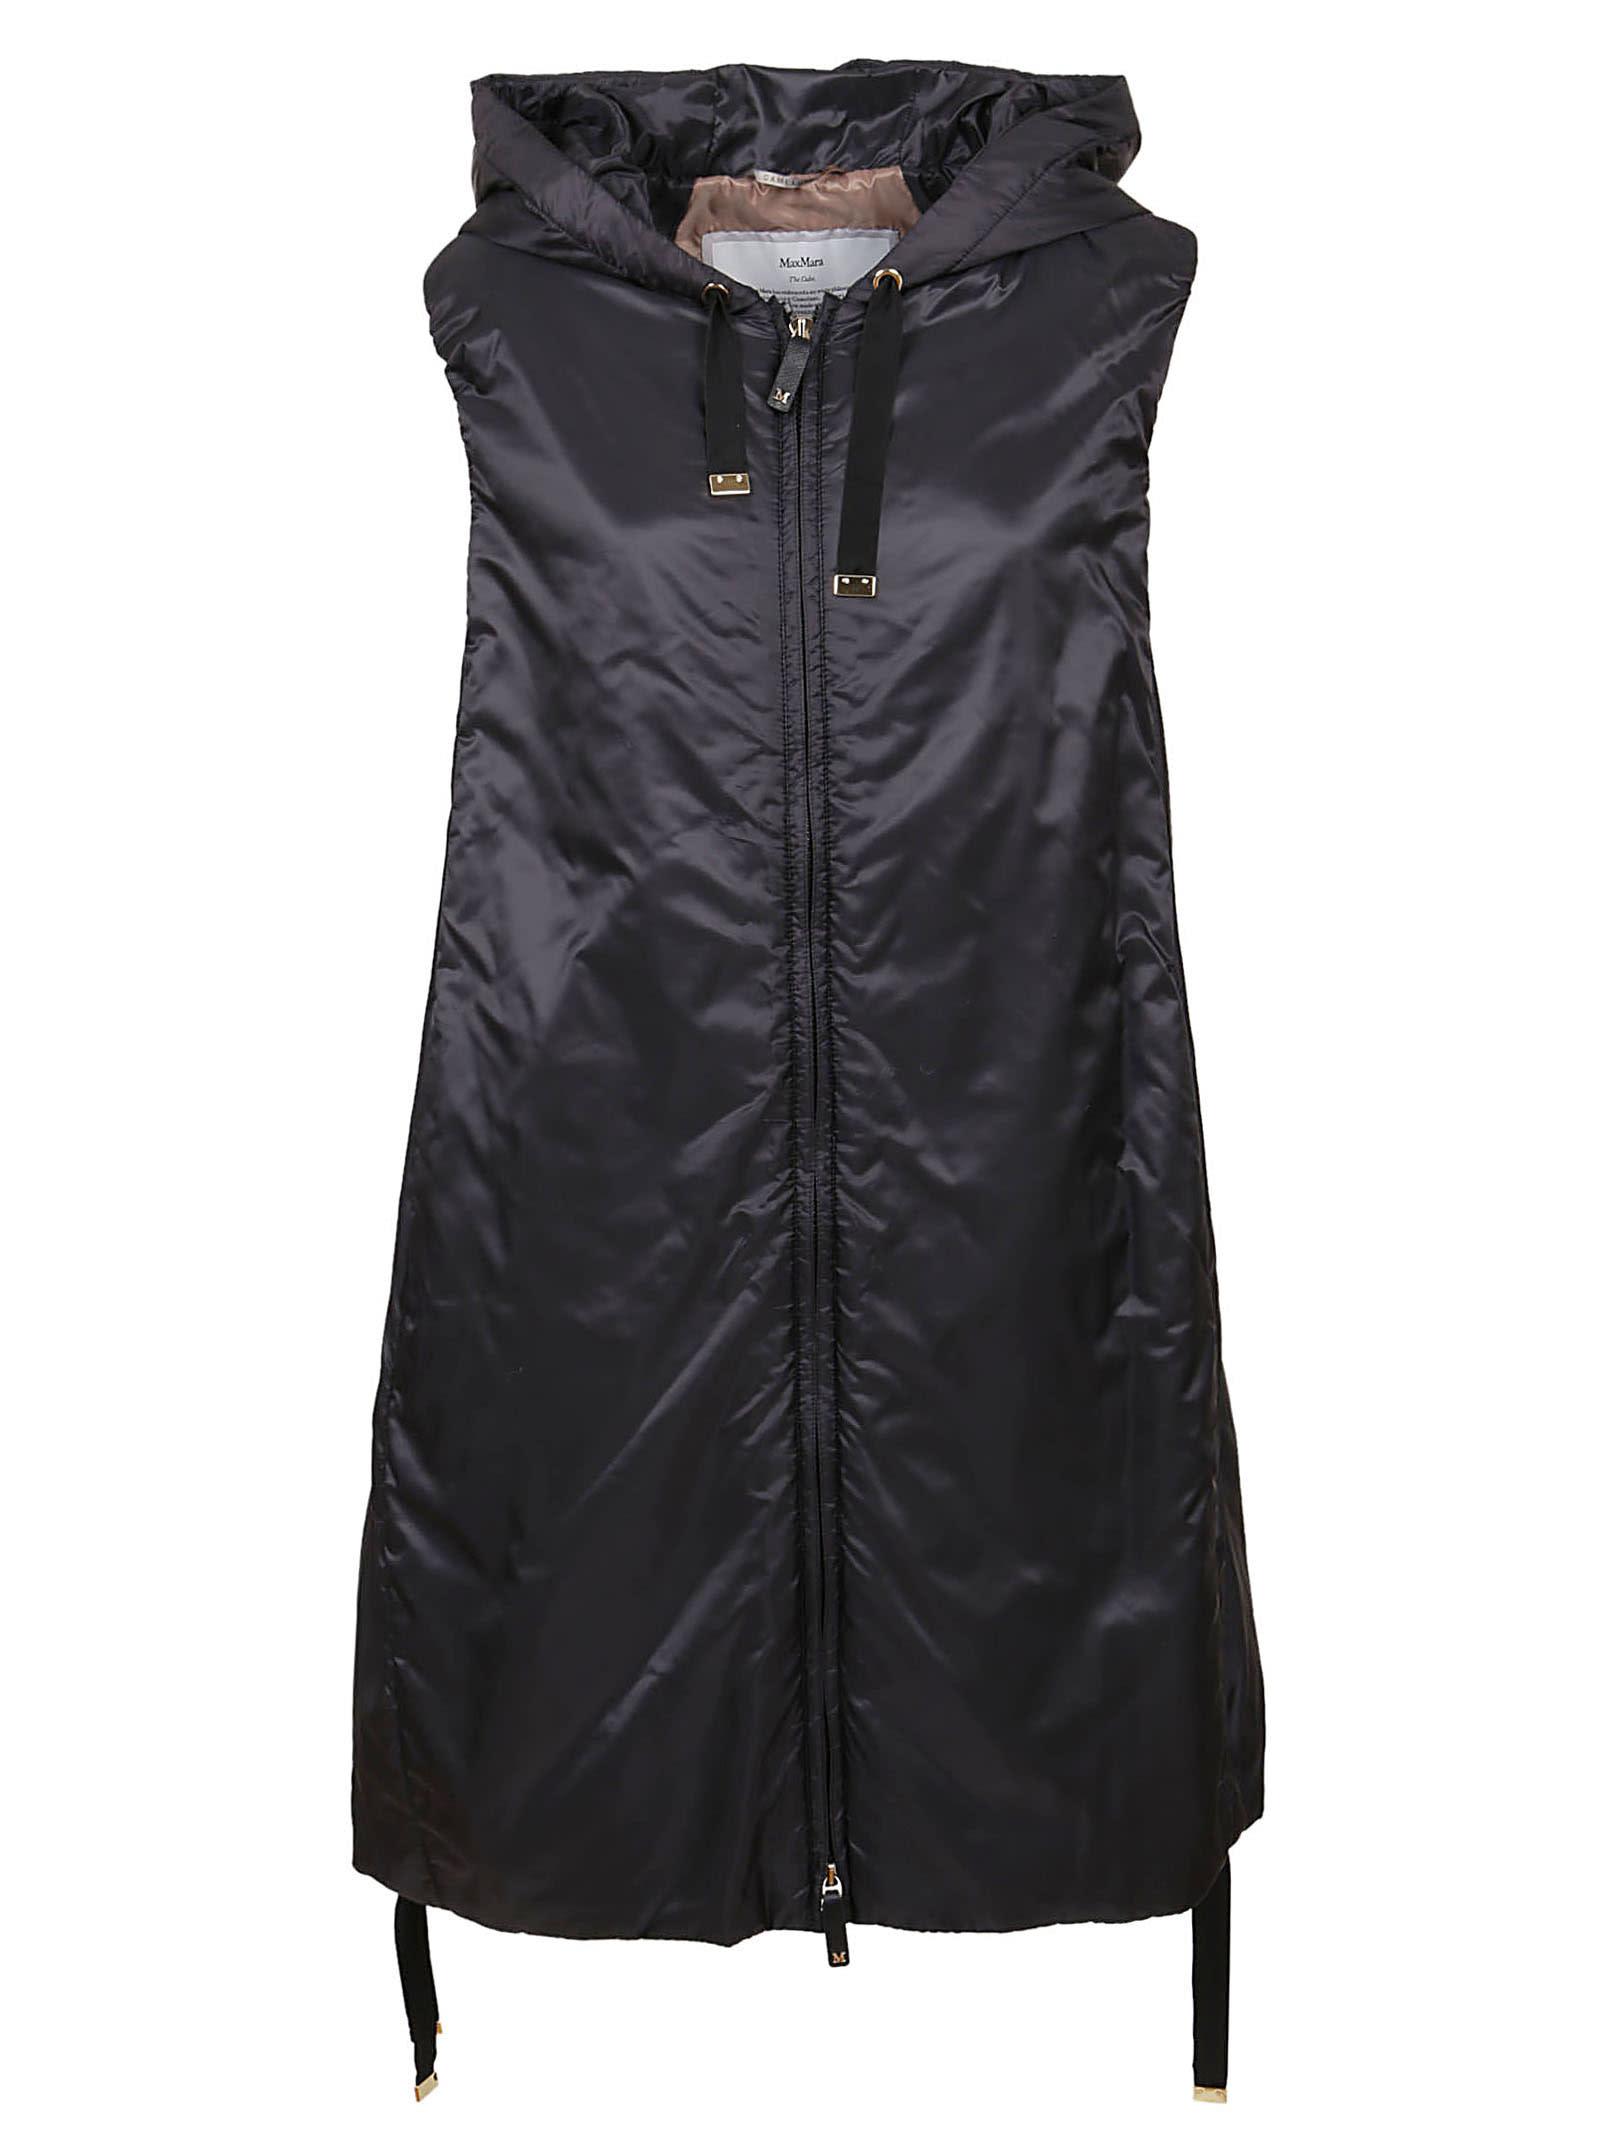 Max Mara Black Technical Fabric Vest